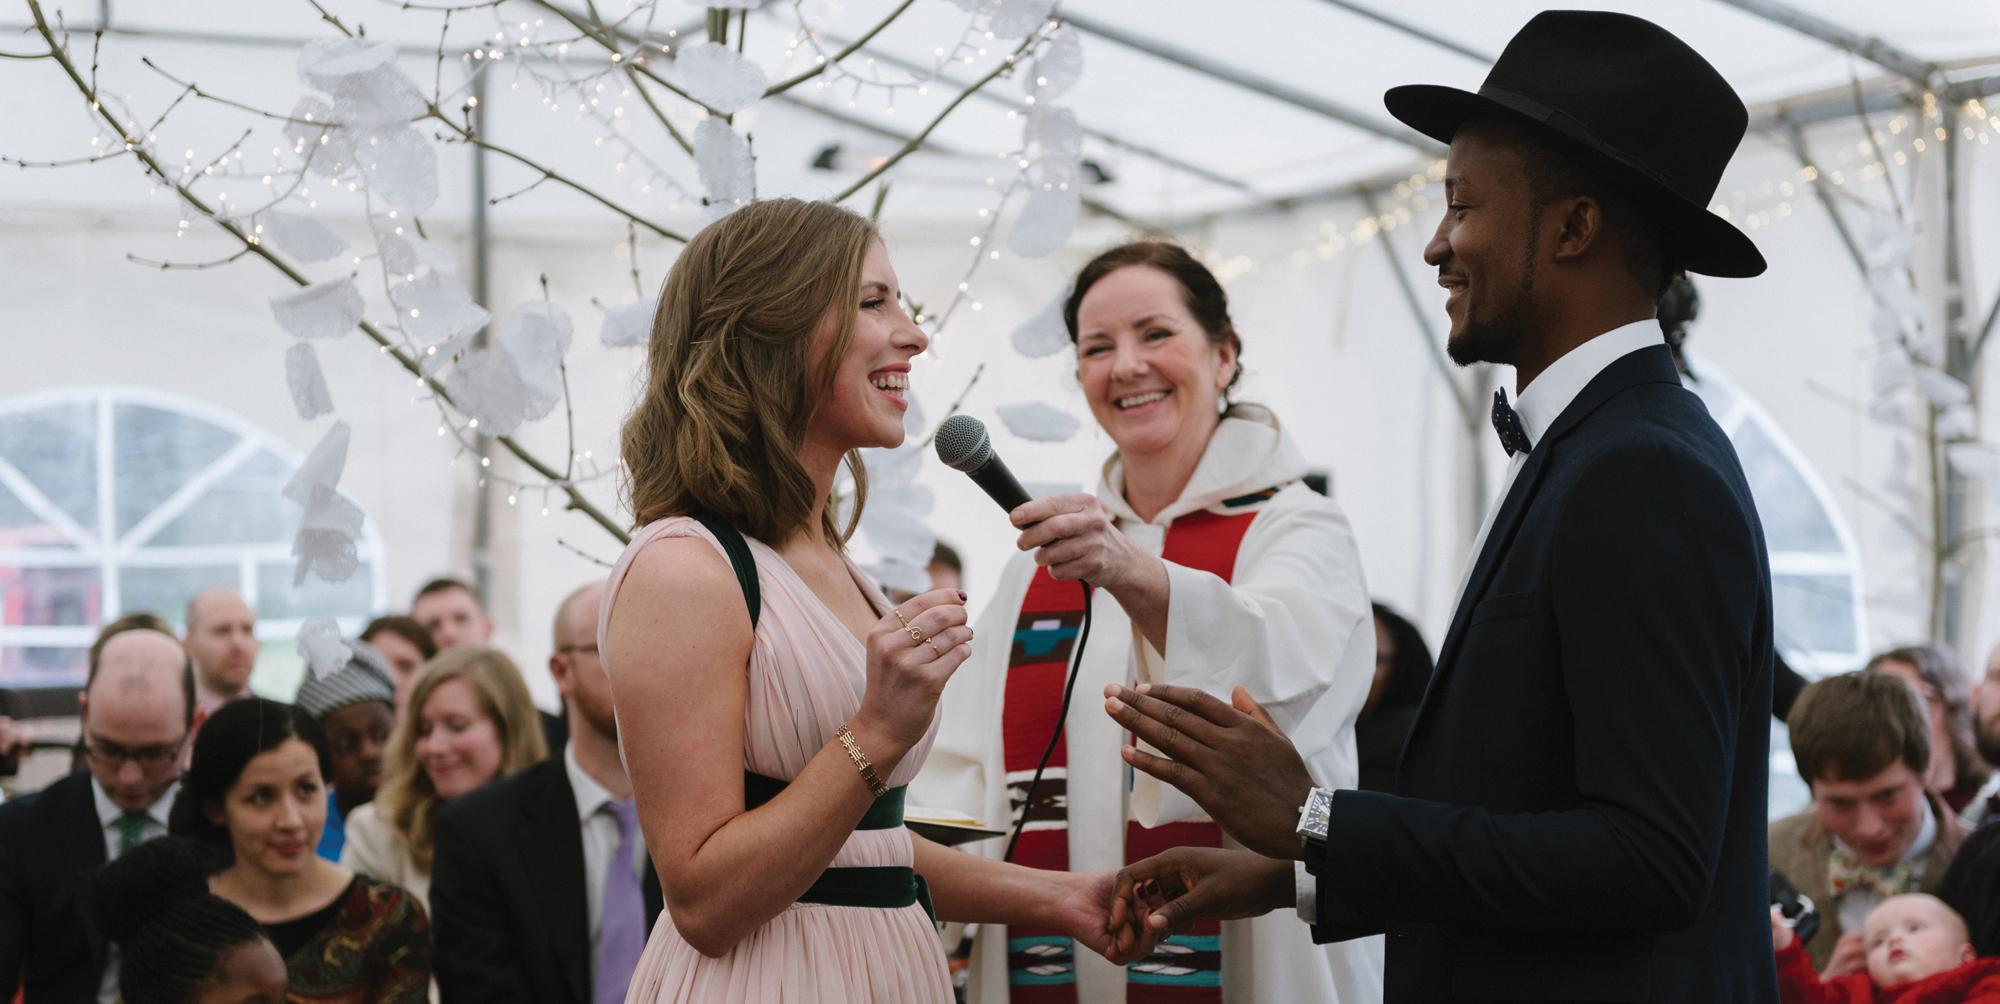 real_irish_wedding_inspire_Weddings_magazine_4.jpg